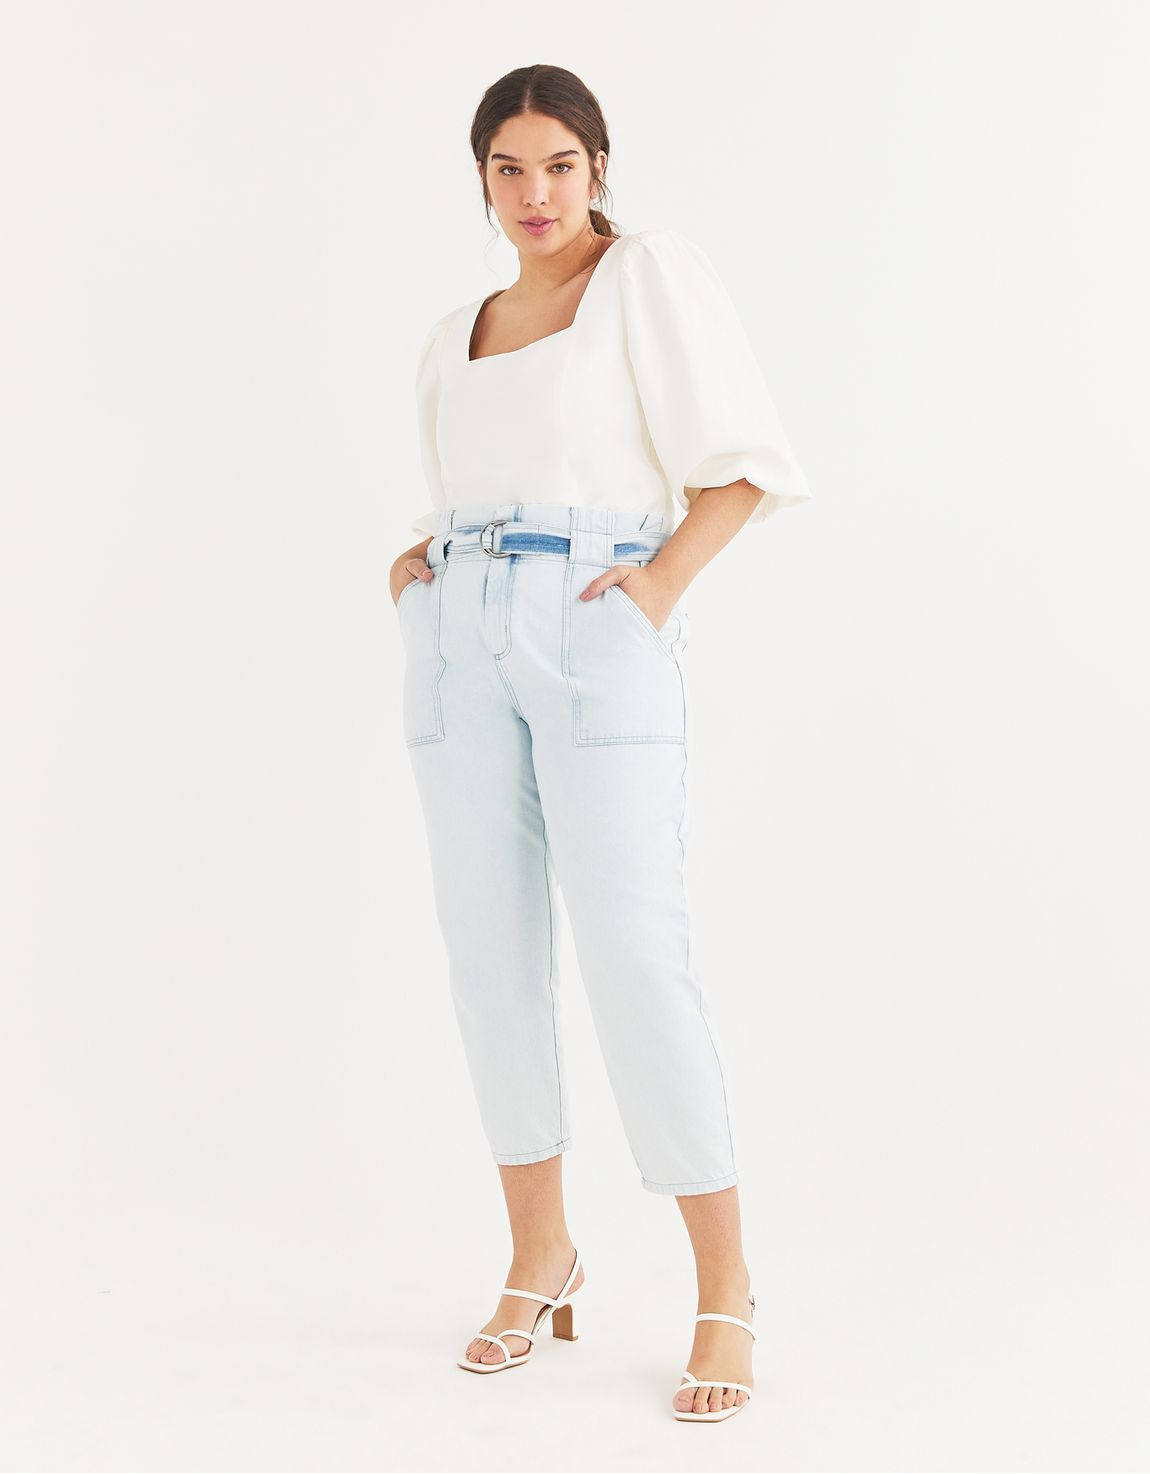 Calça jeans slim bolso aplicado